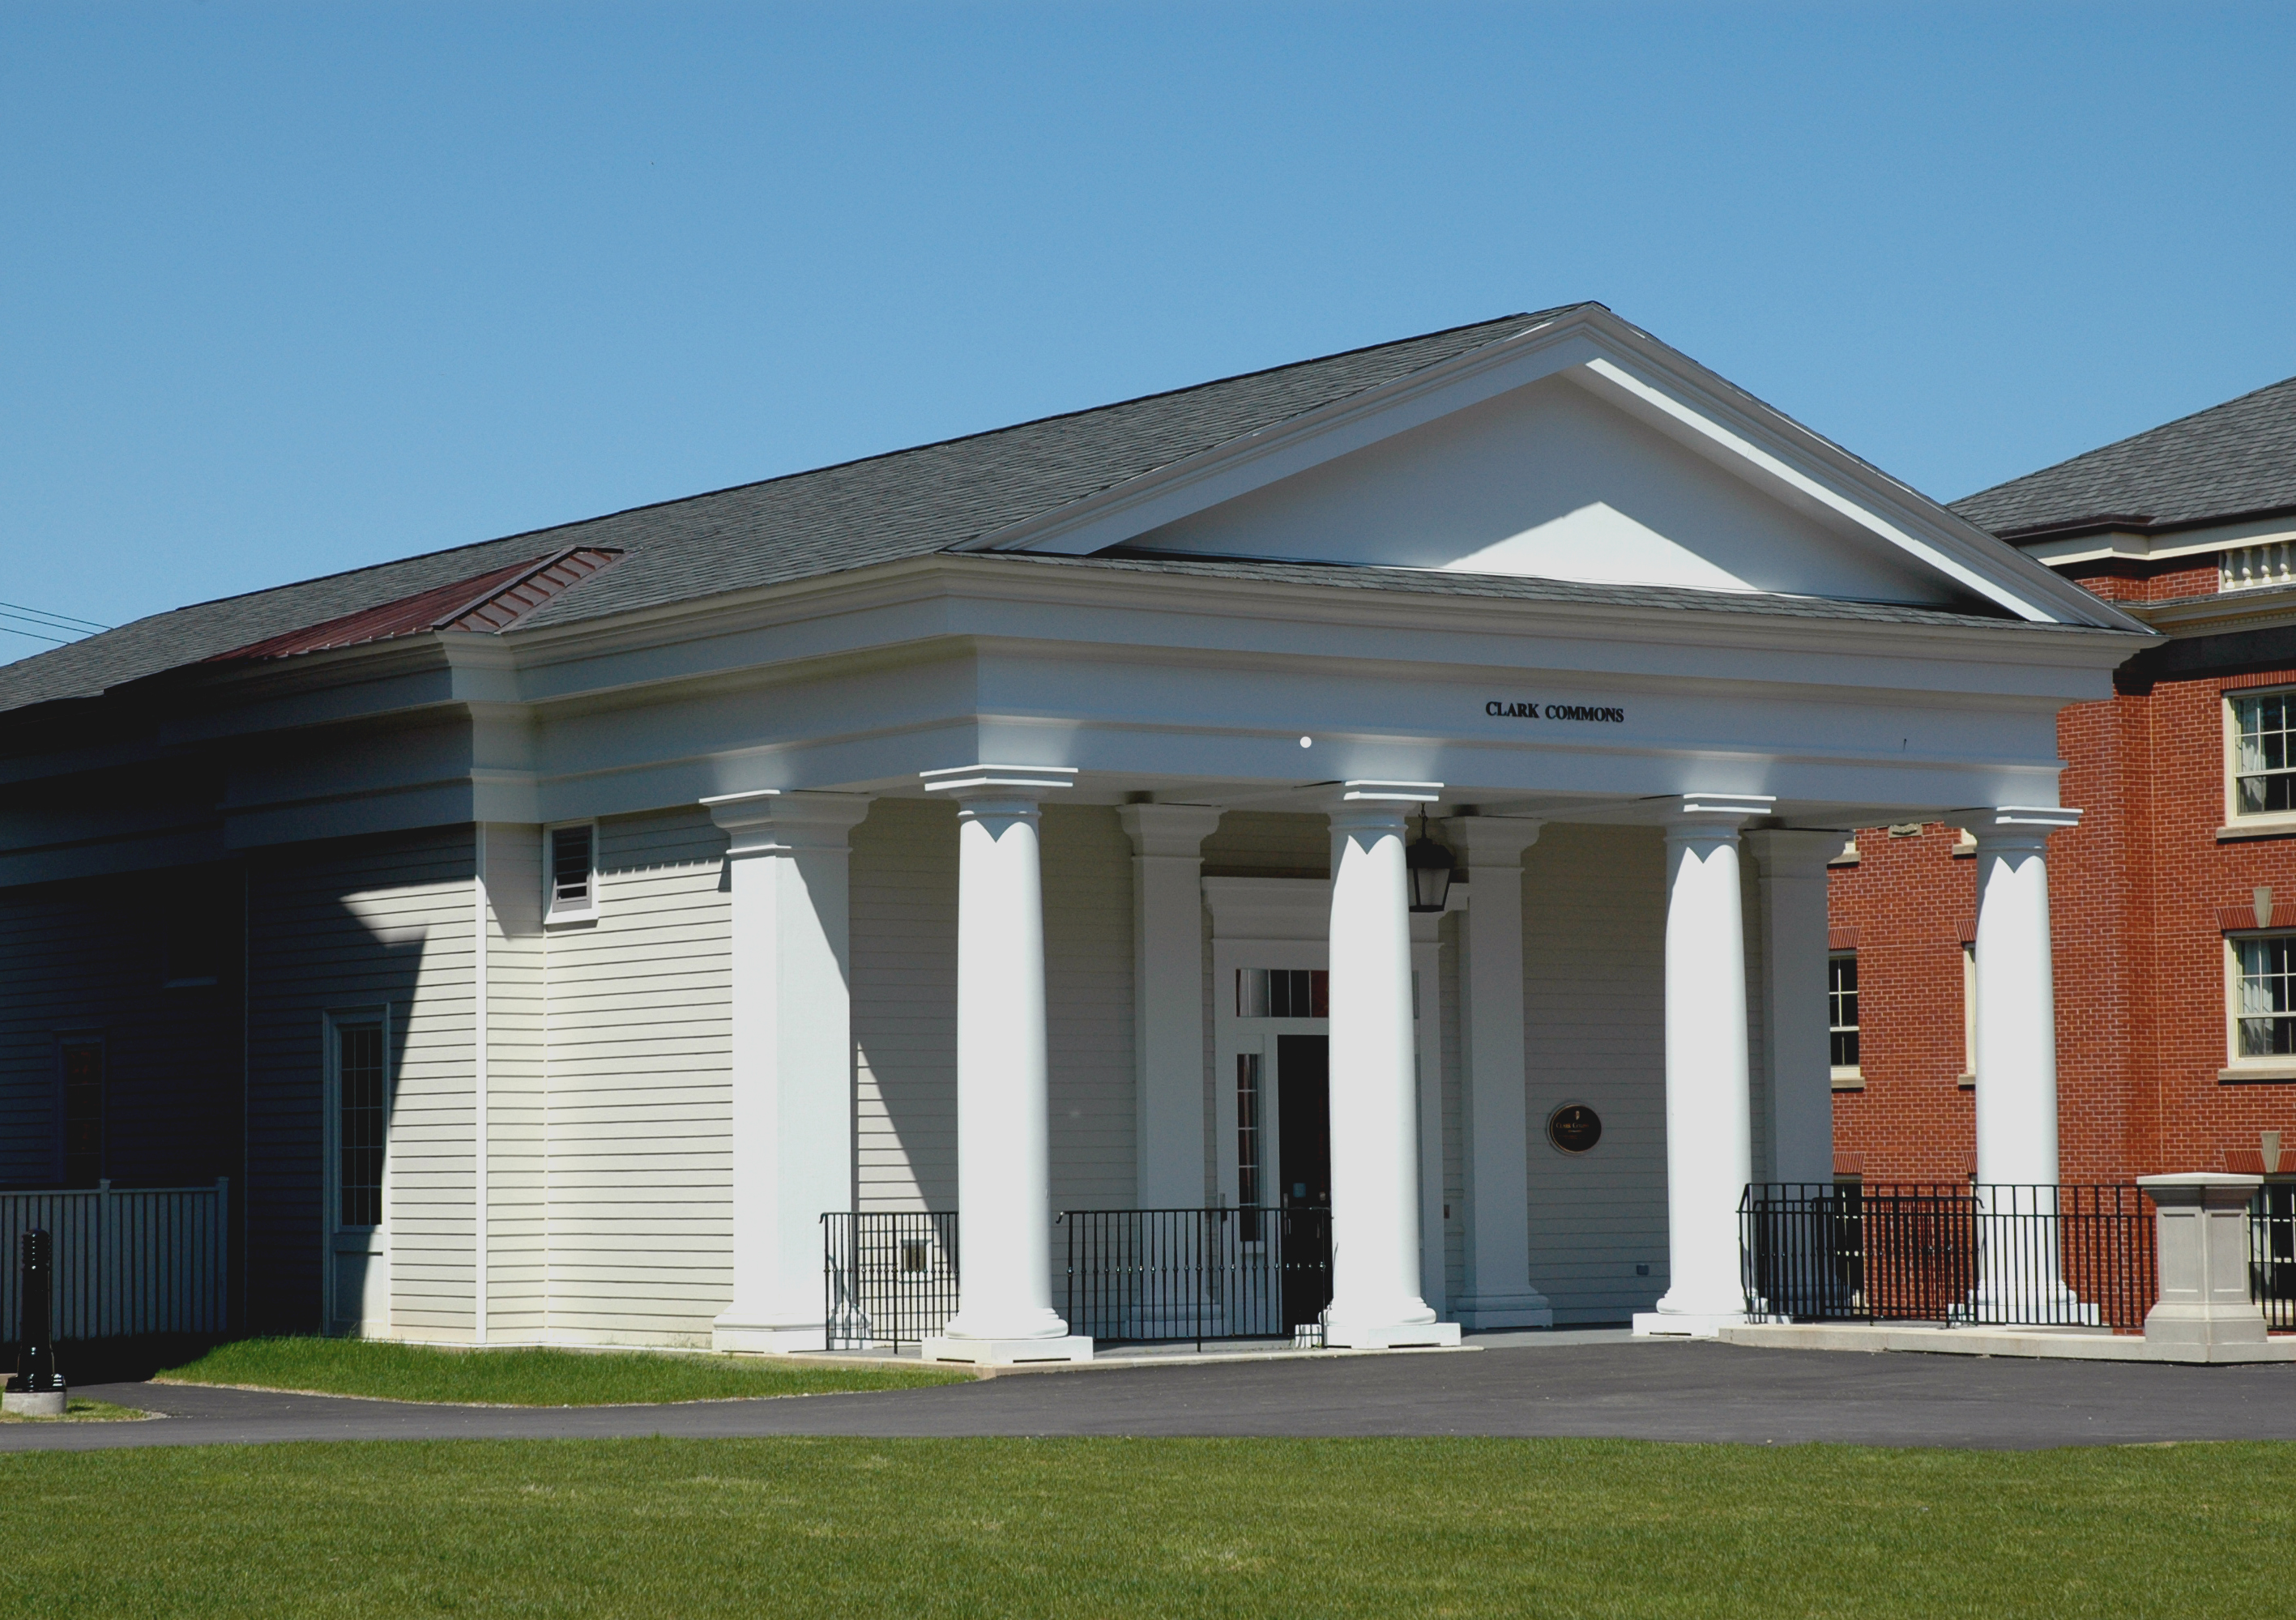 Wheelock Dining Hall Menu Acadia chartwells at acadia  : Clark20Commons from bphnq.adtddns.asia size 2834 x 2000 jpeg 3239kB